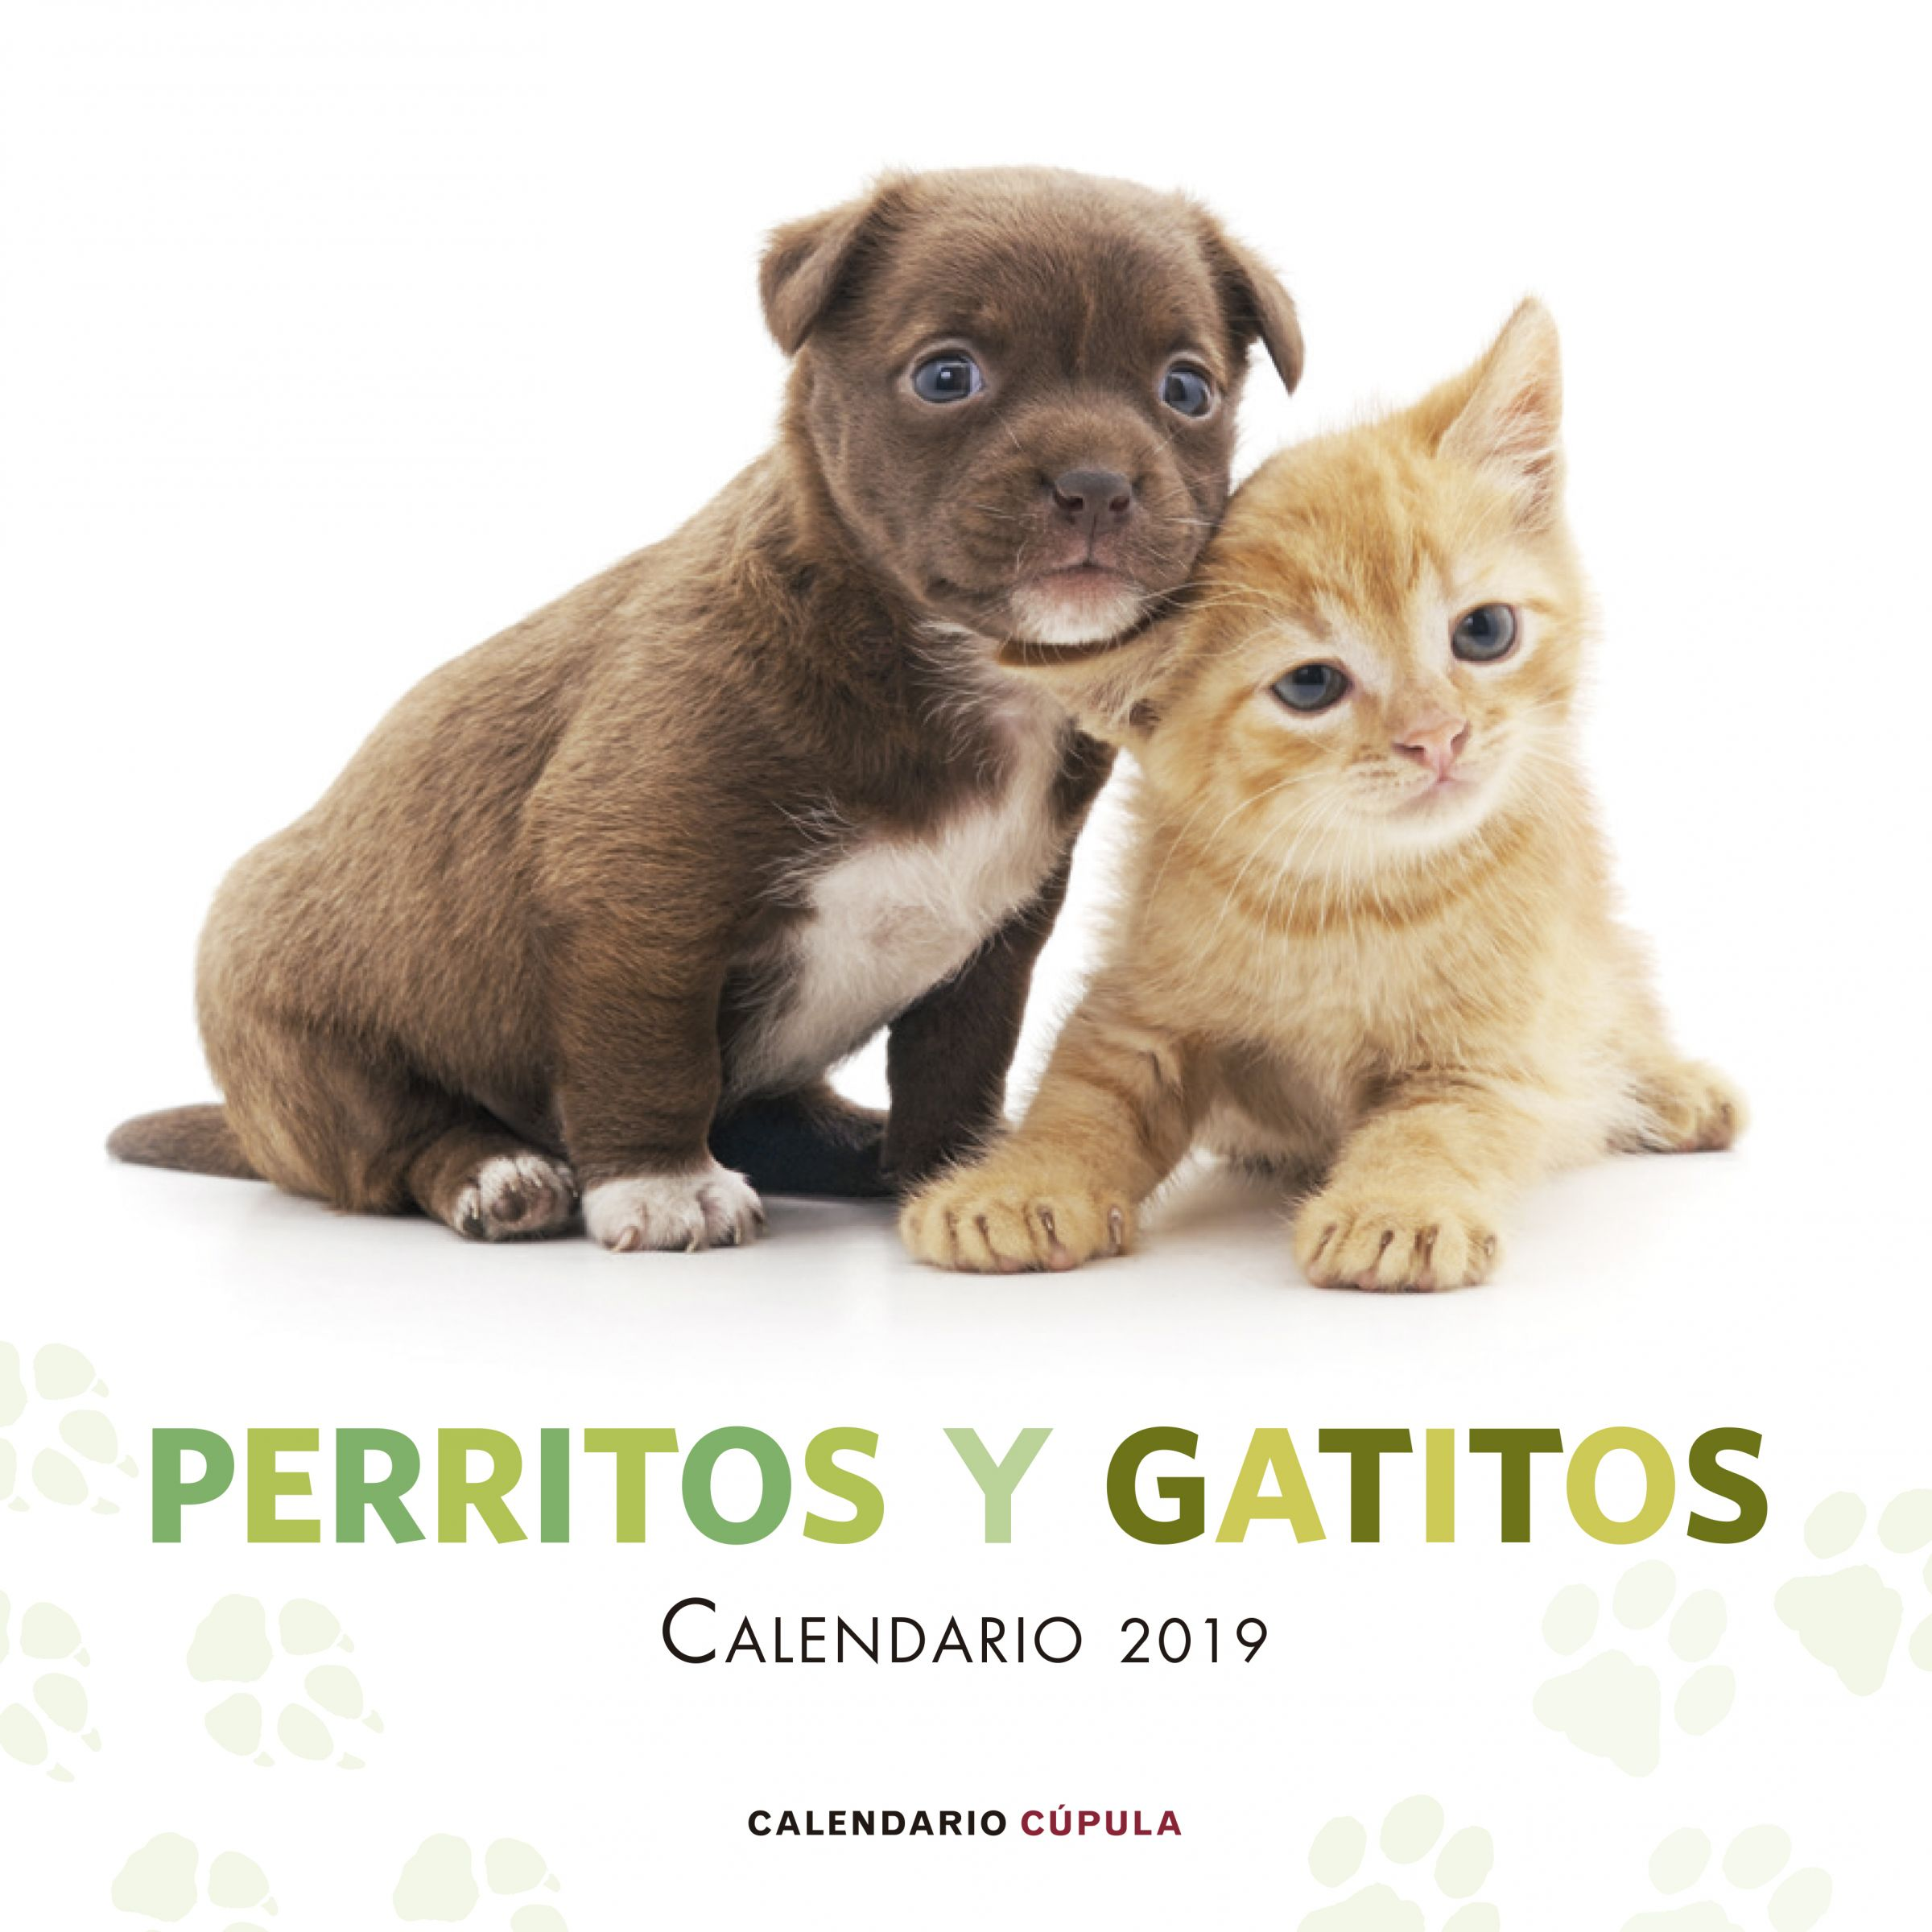 Calendario Perritos y gatitos 2019 | Planeta de Libros